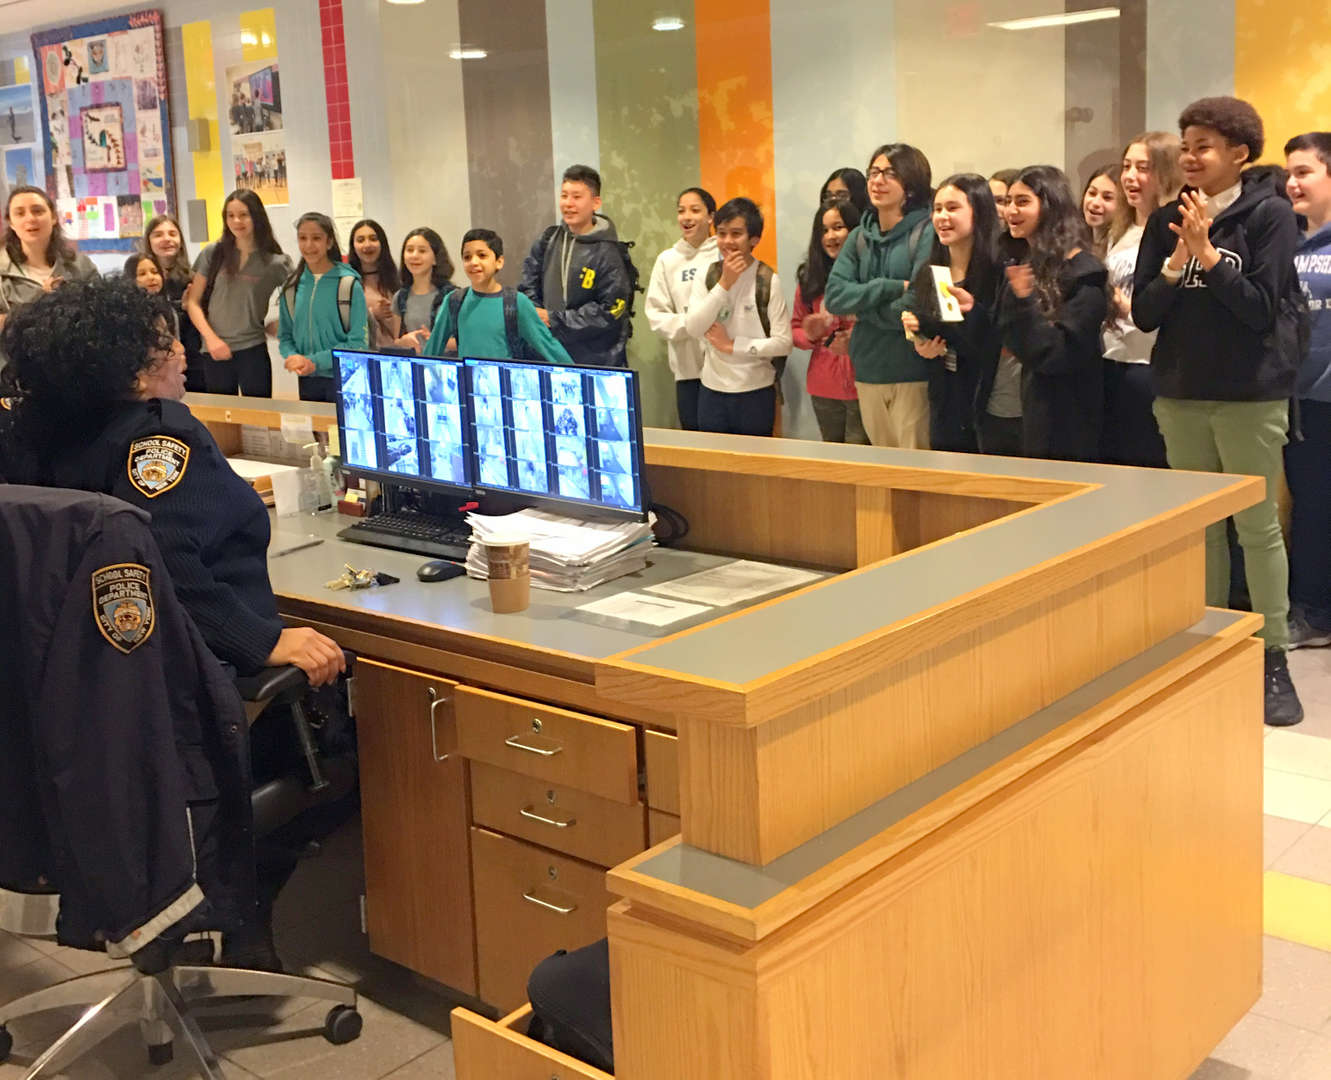 Photo of students singing happy birthday to Agent Skinner